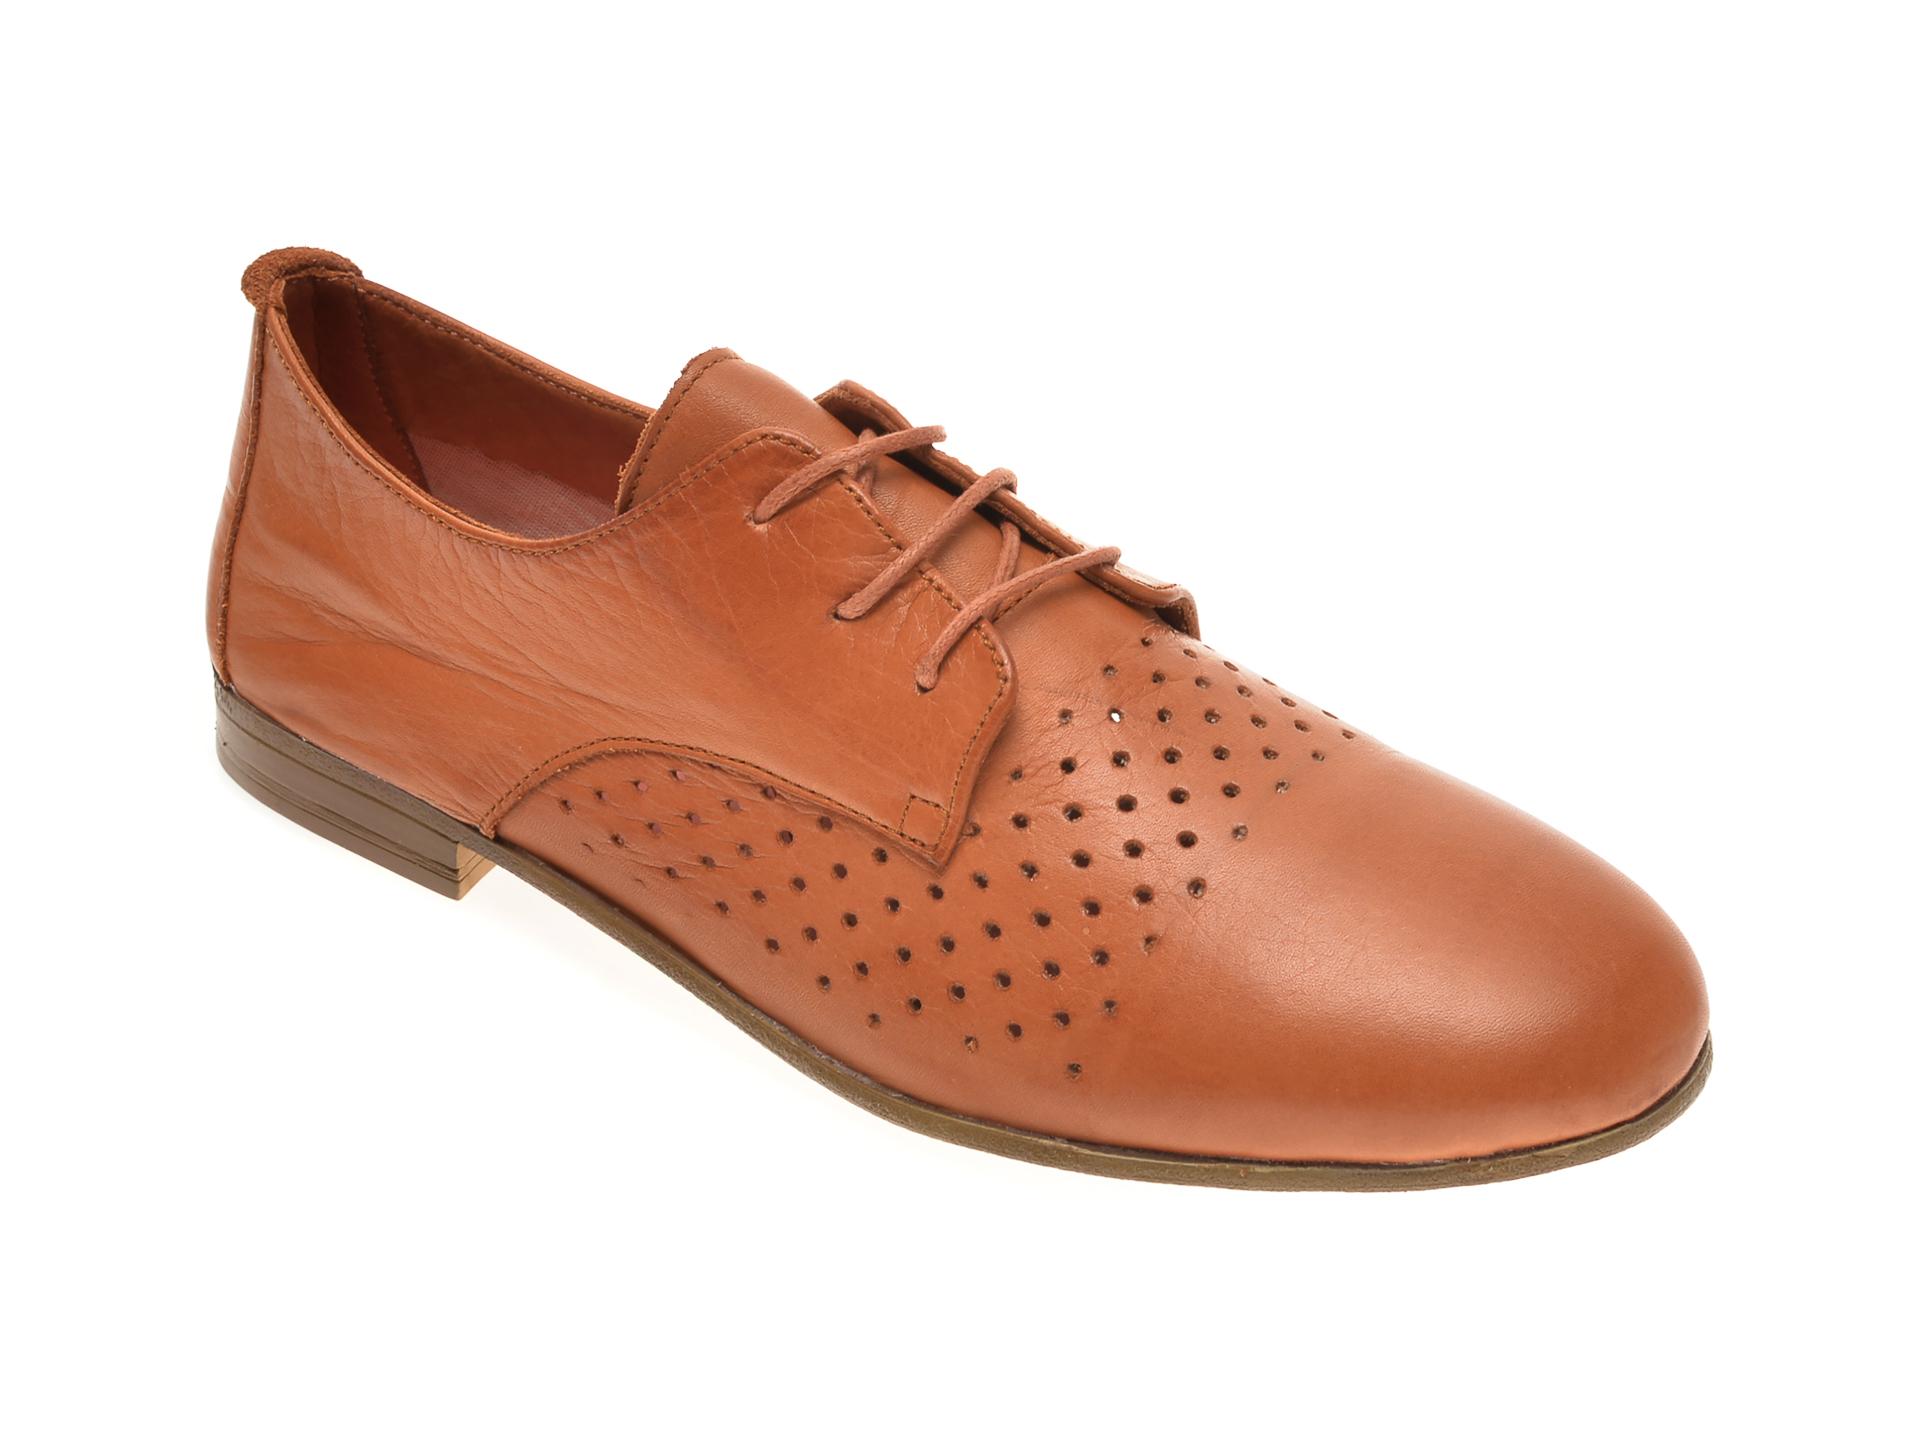 Pantofi BABOOS maro, 1106, din piele naturala imagine